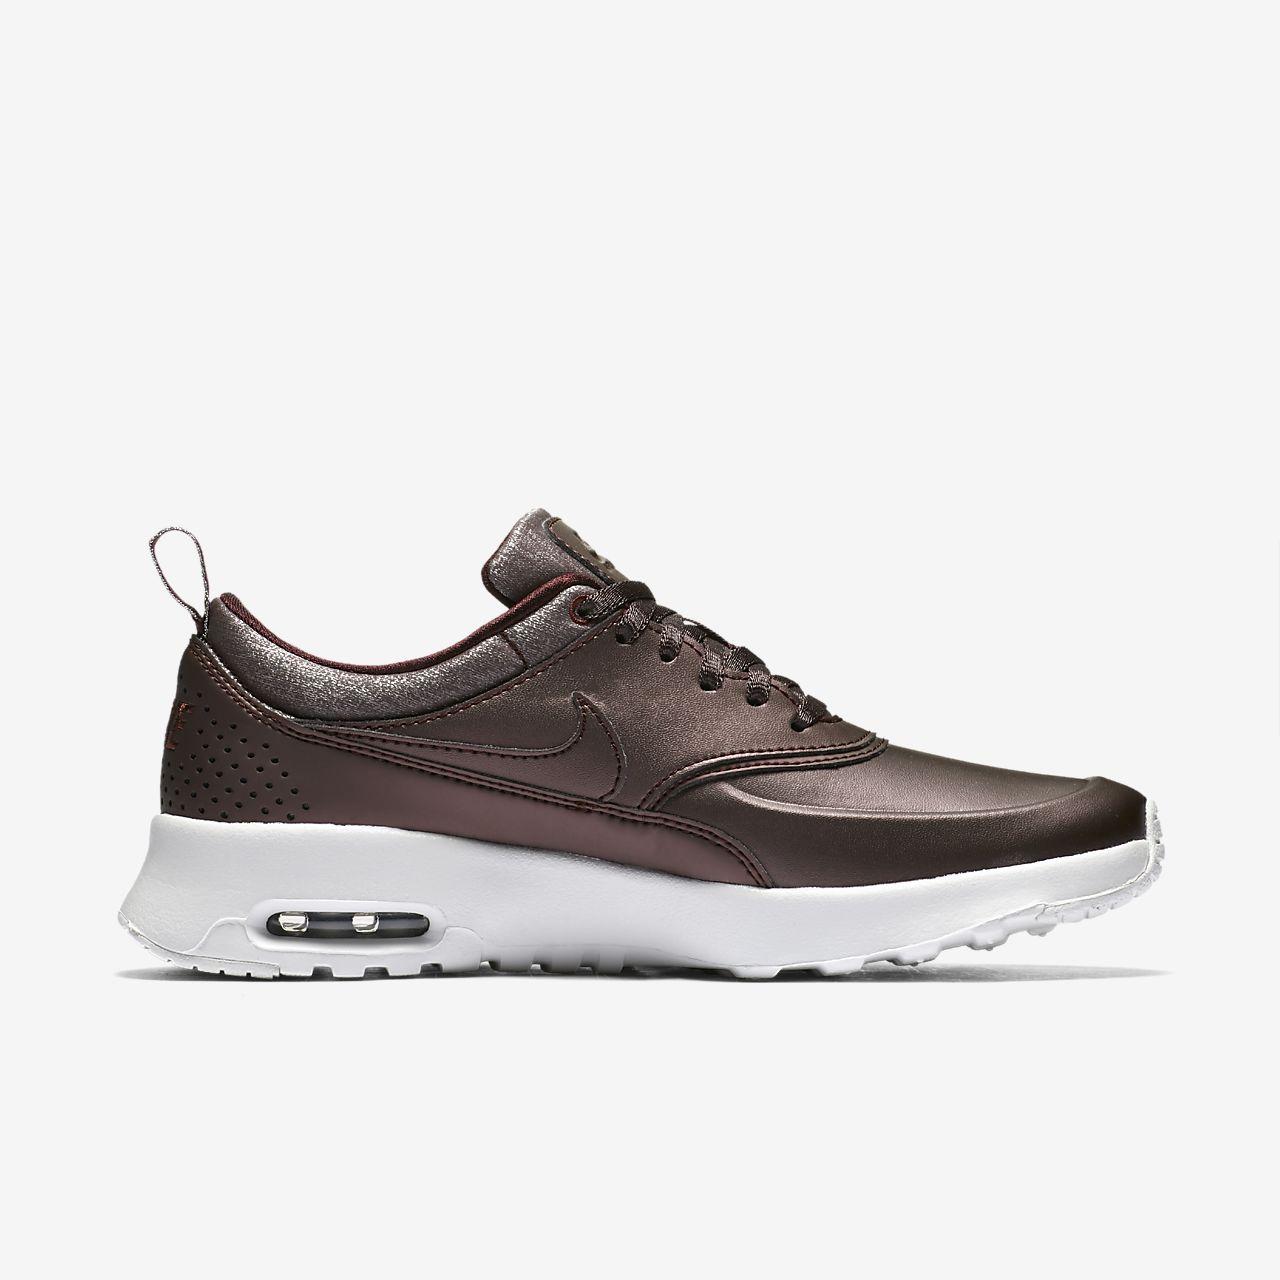 Nike Women's Nike Air Max Thea Premium - scarpe da ginnastica - donna El Mayor Proveedor BL7NYQda